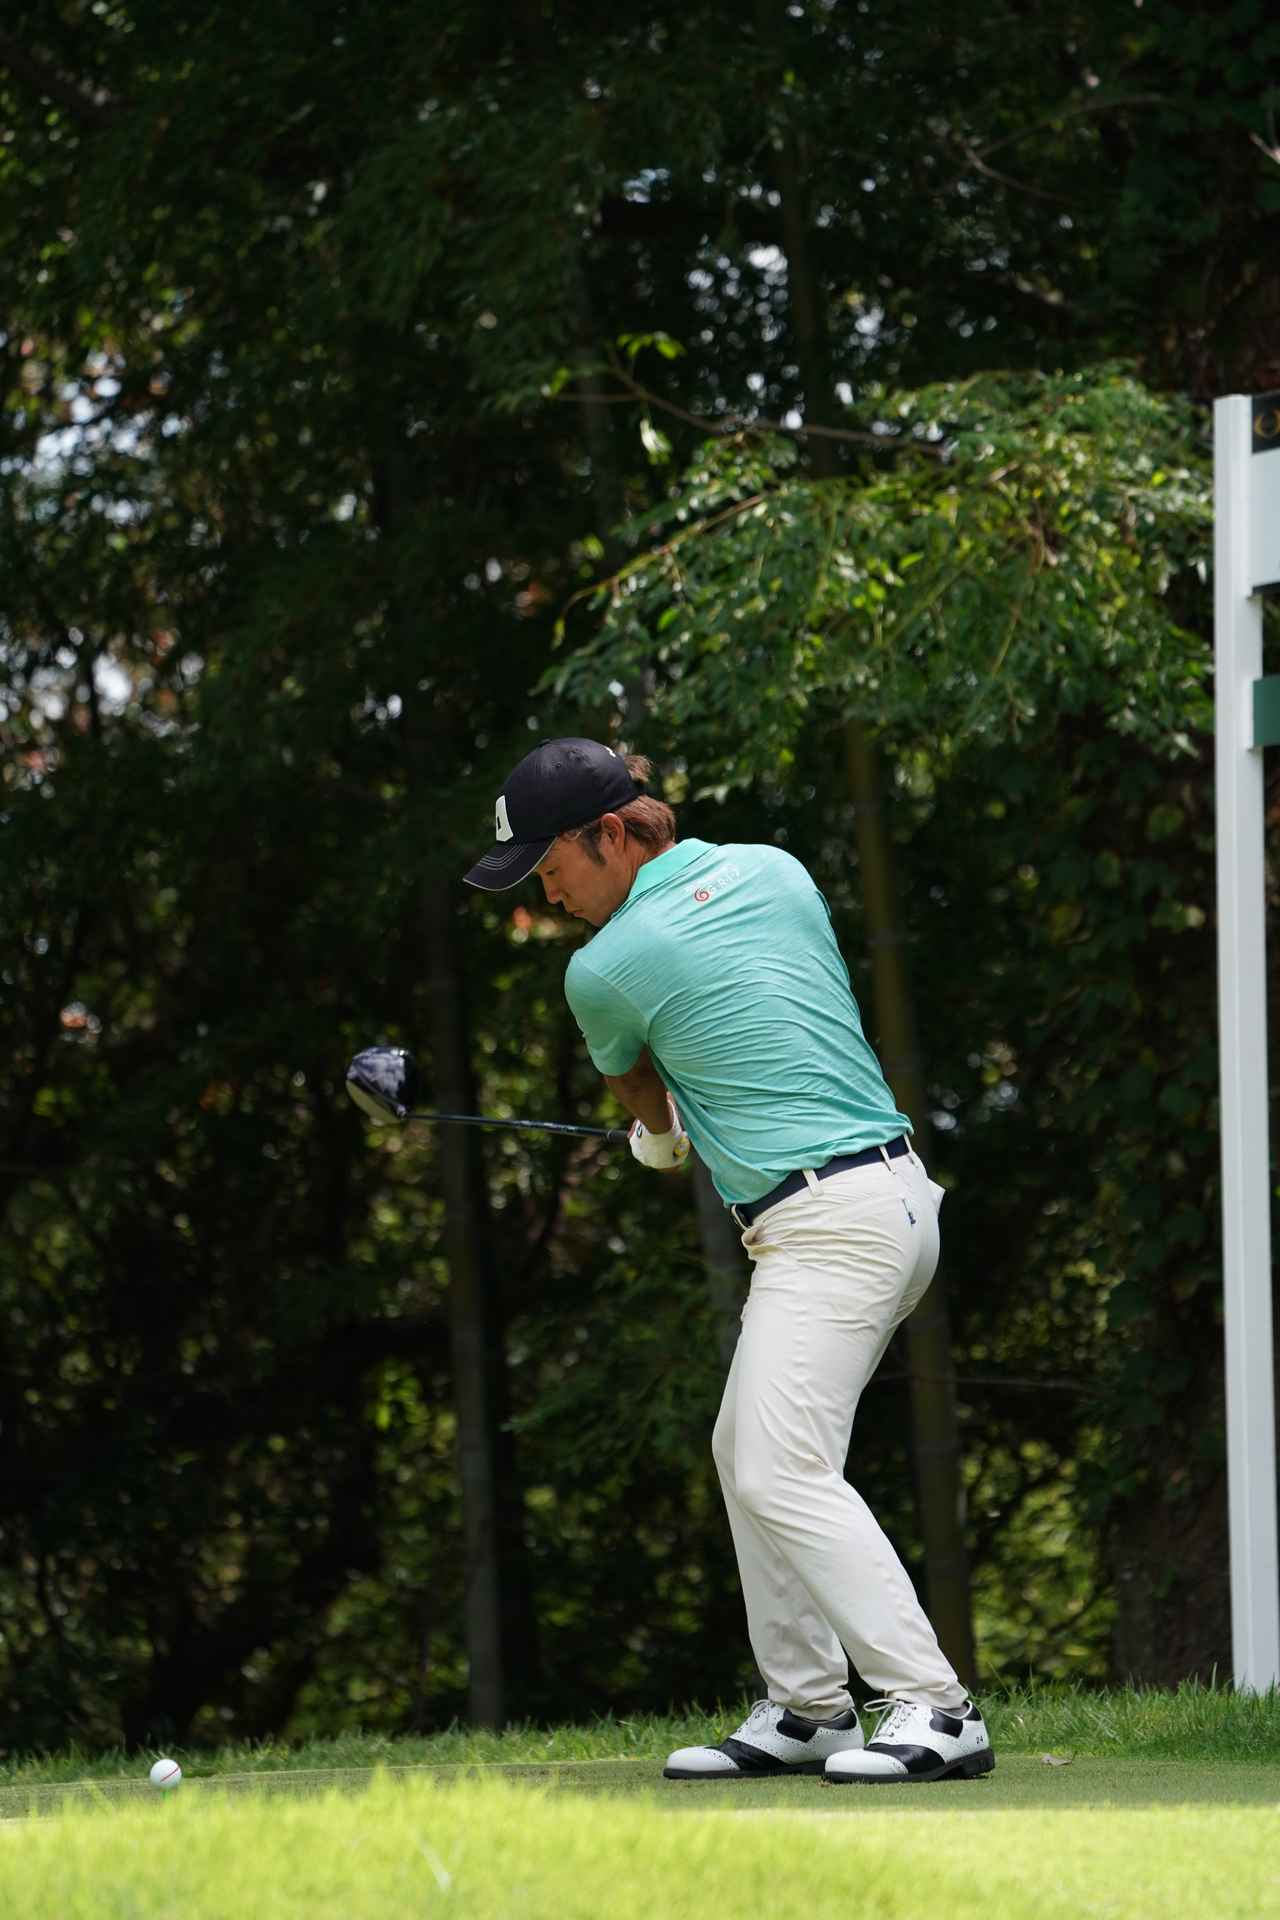 Images : 2番目の画像 - 浅地洋佑のドライバー連続写真 - みんなのゴルフダイジェスト